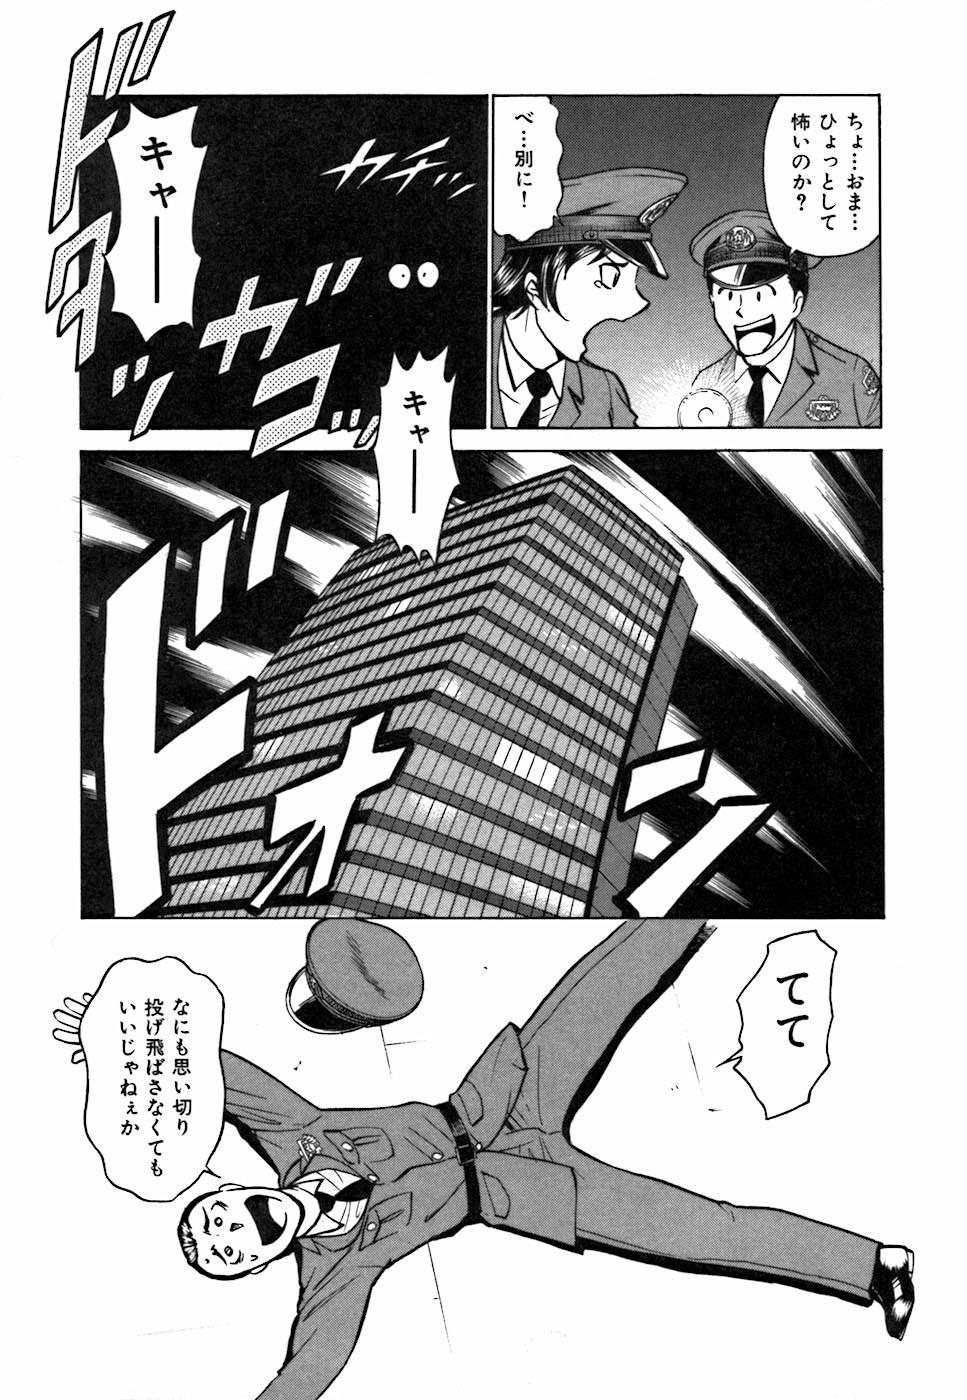 Kimi ga Nozomu Katachi | Appearance for which you hope 112